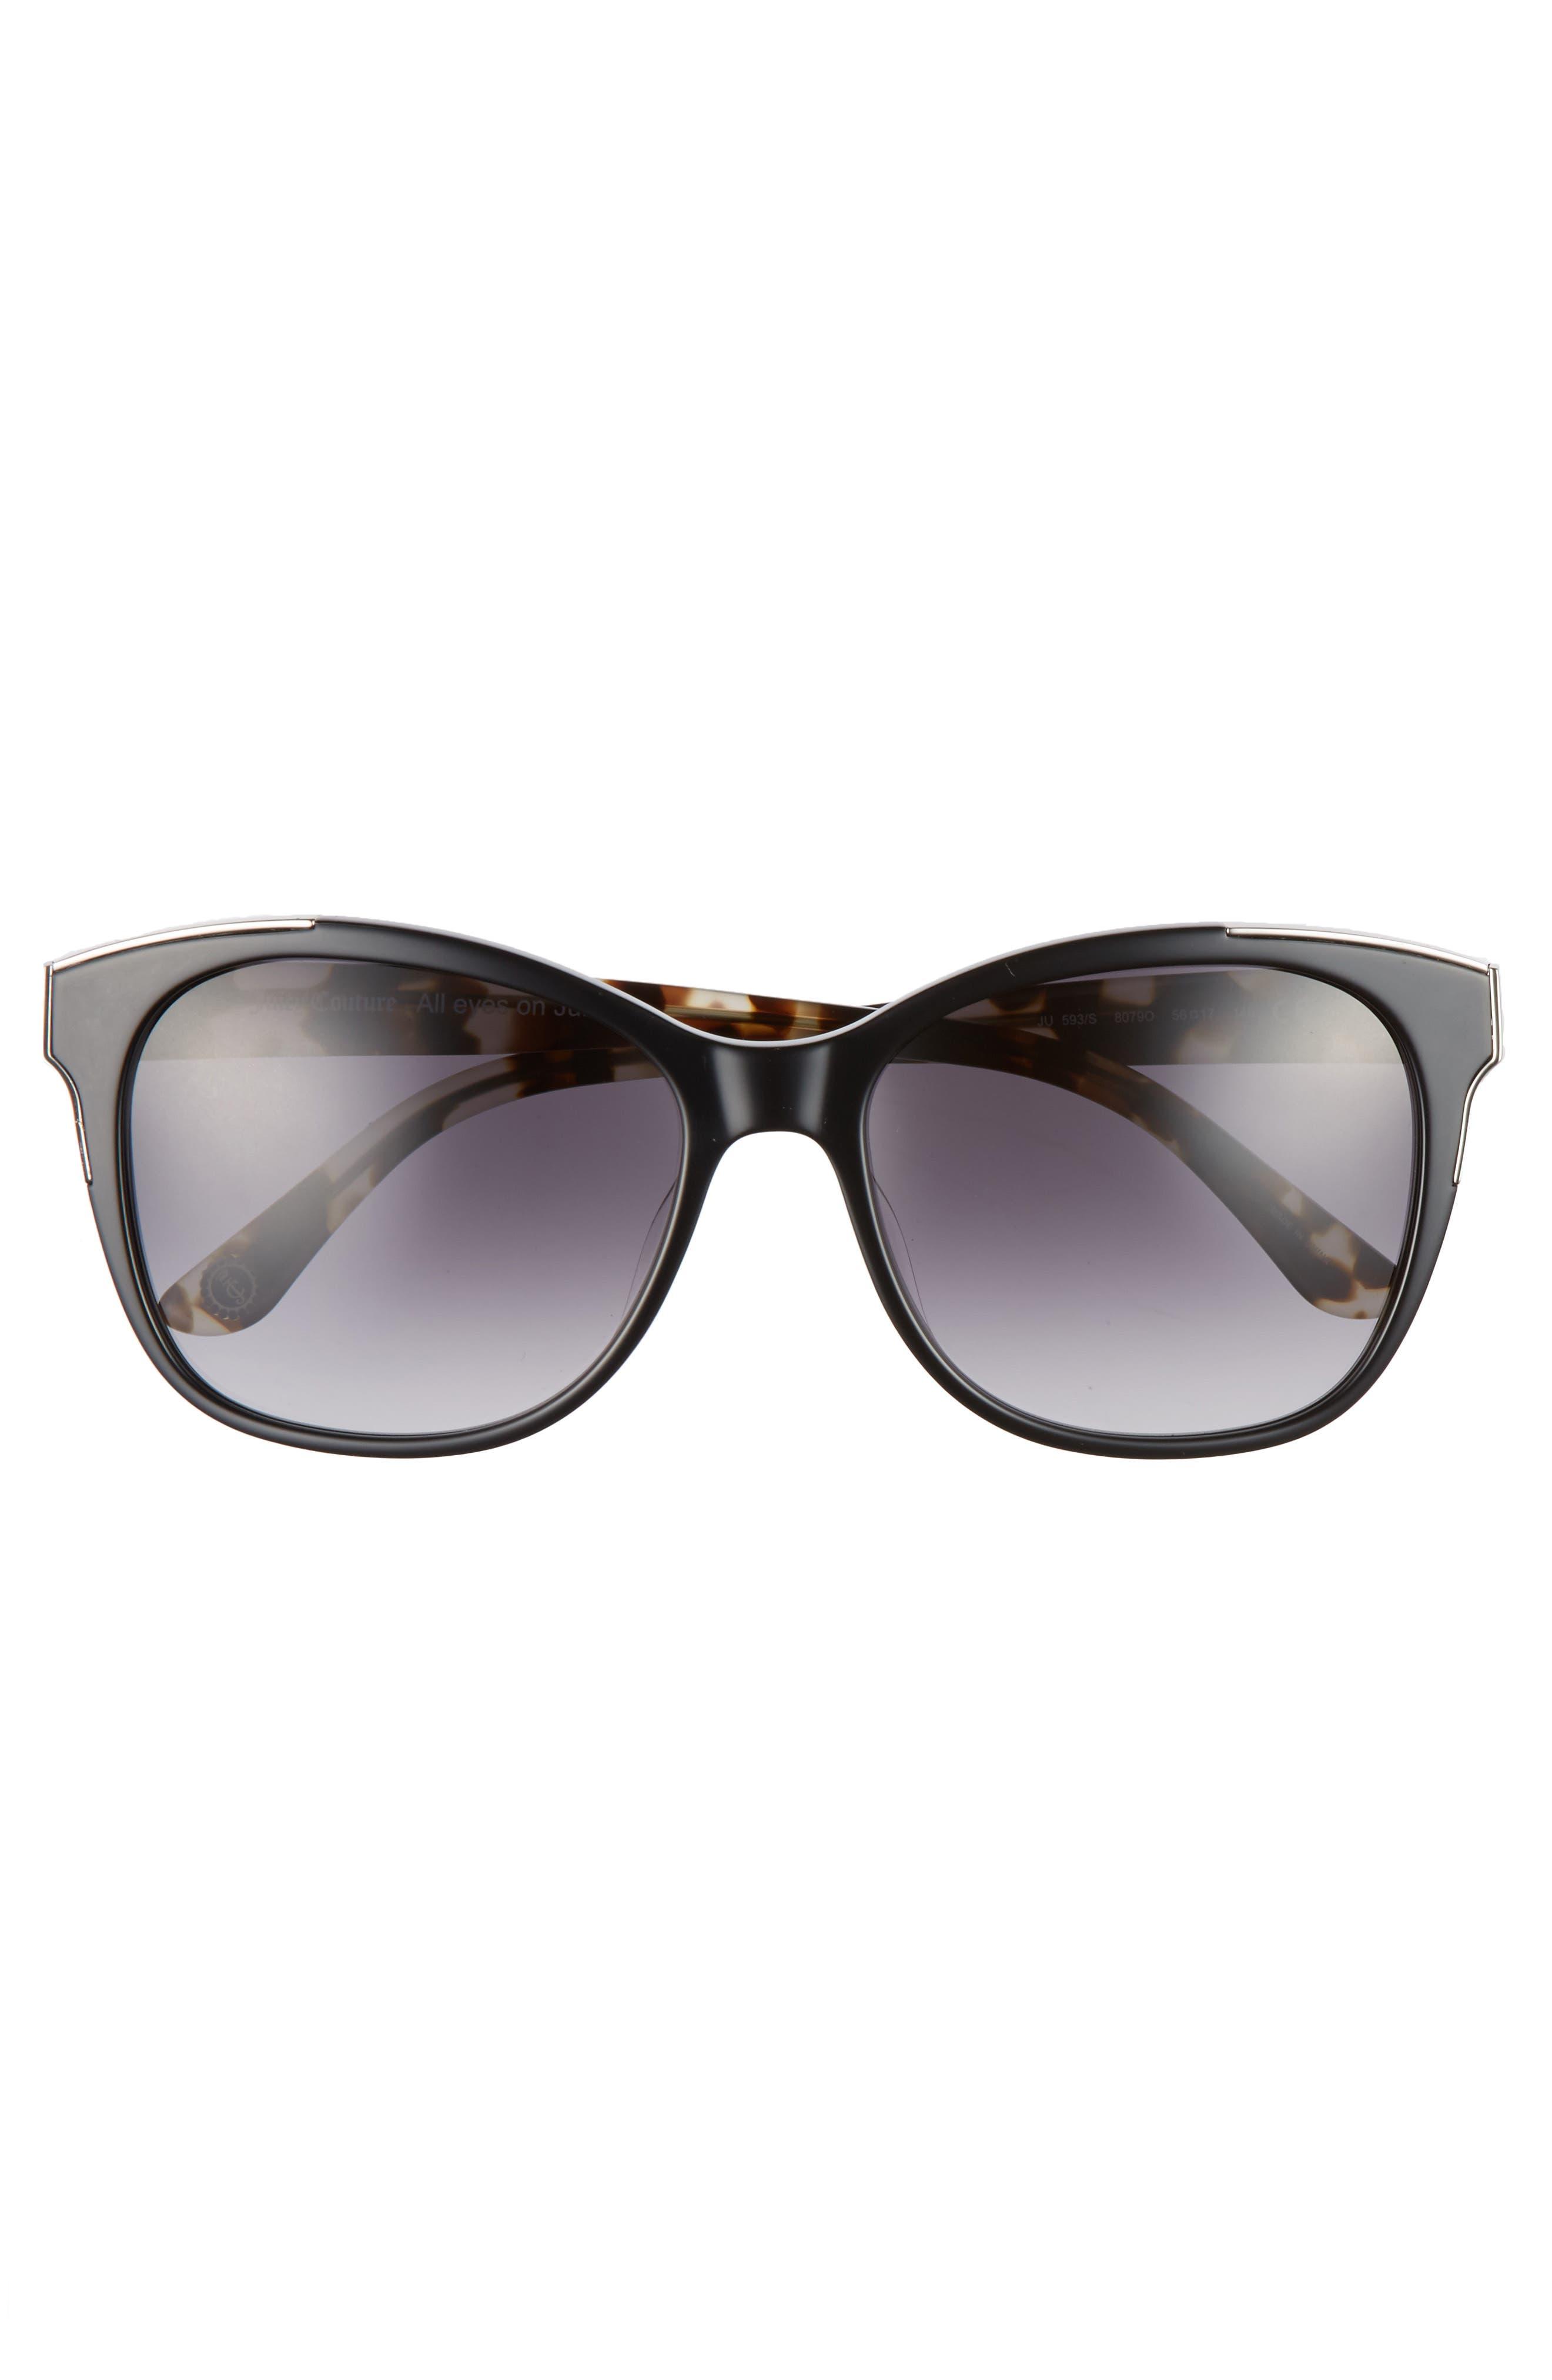 JUICY COUTURE, Black Label 56mm Cat Eye Sunglasses, Alternate thumbnail 3, color, 001